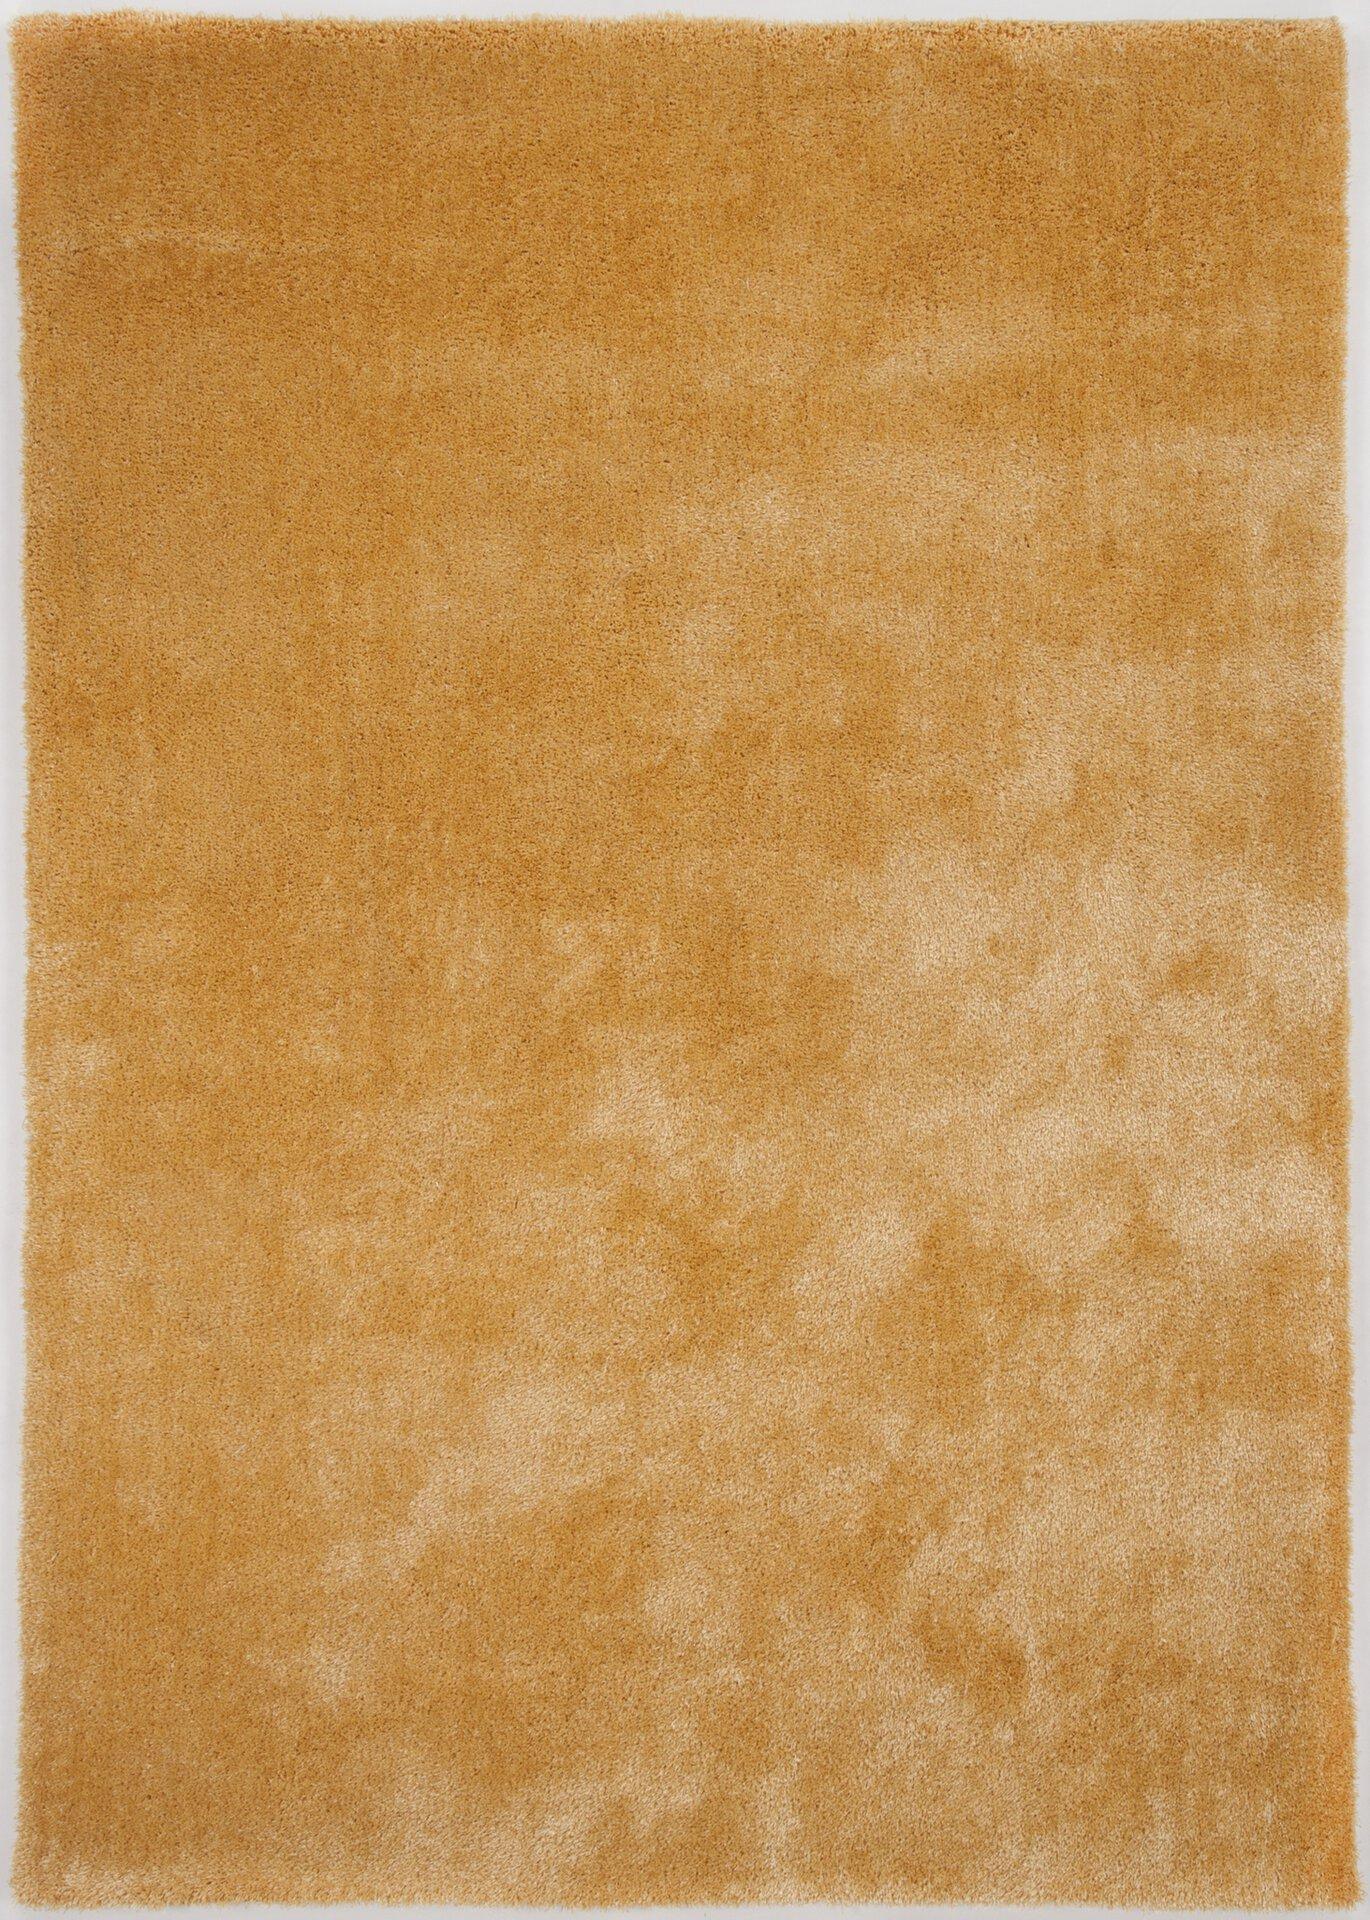 Handtuftteppich Alessandro Gino Falcone Textil gold 50 x 80 cm